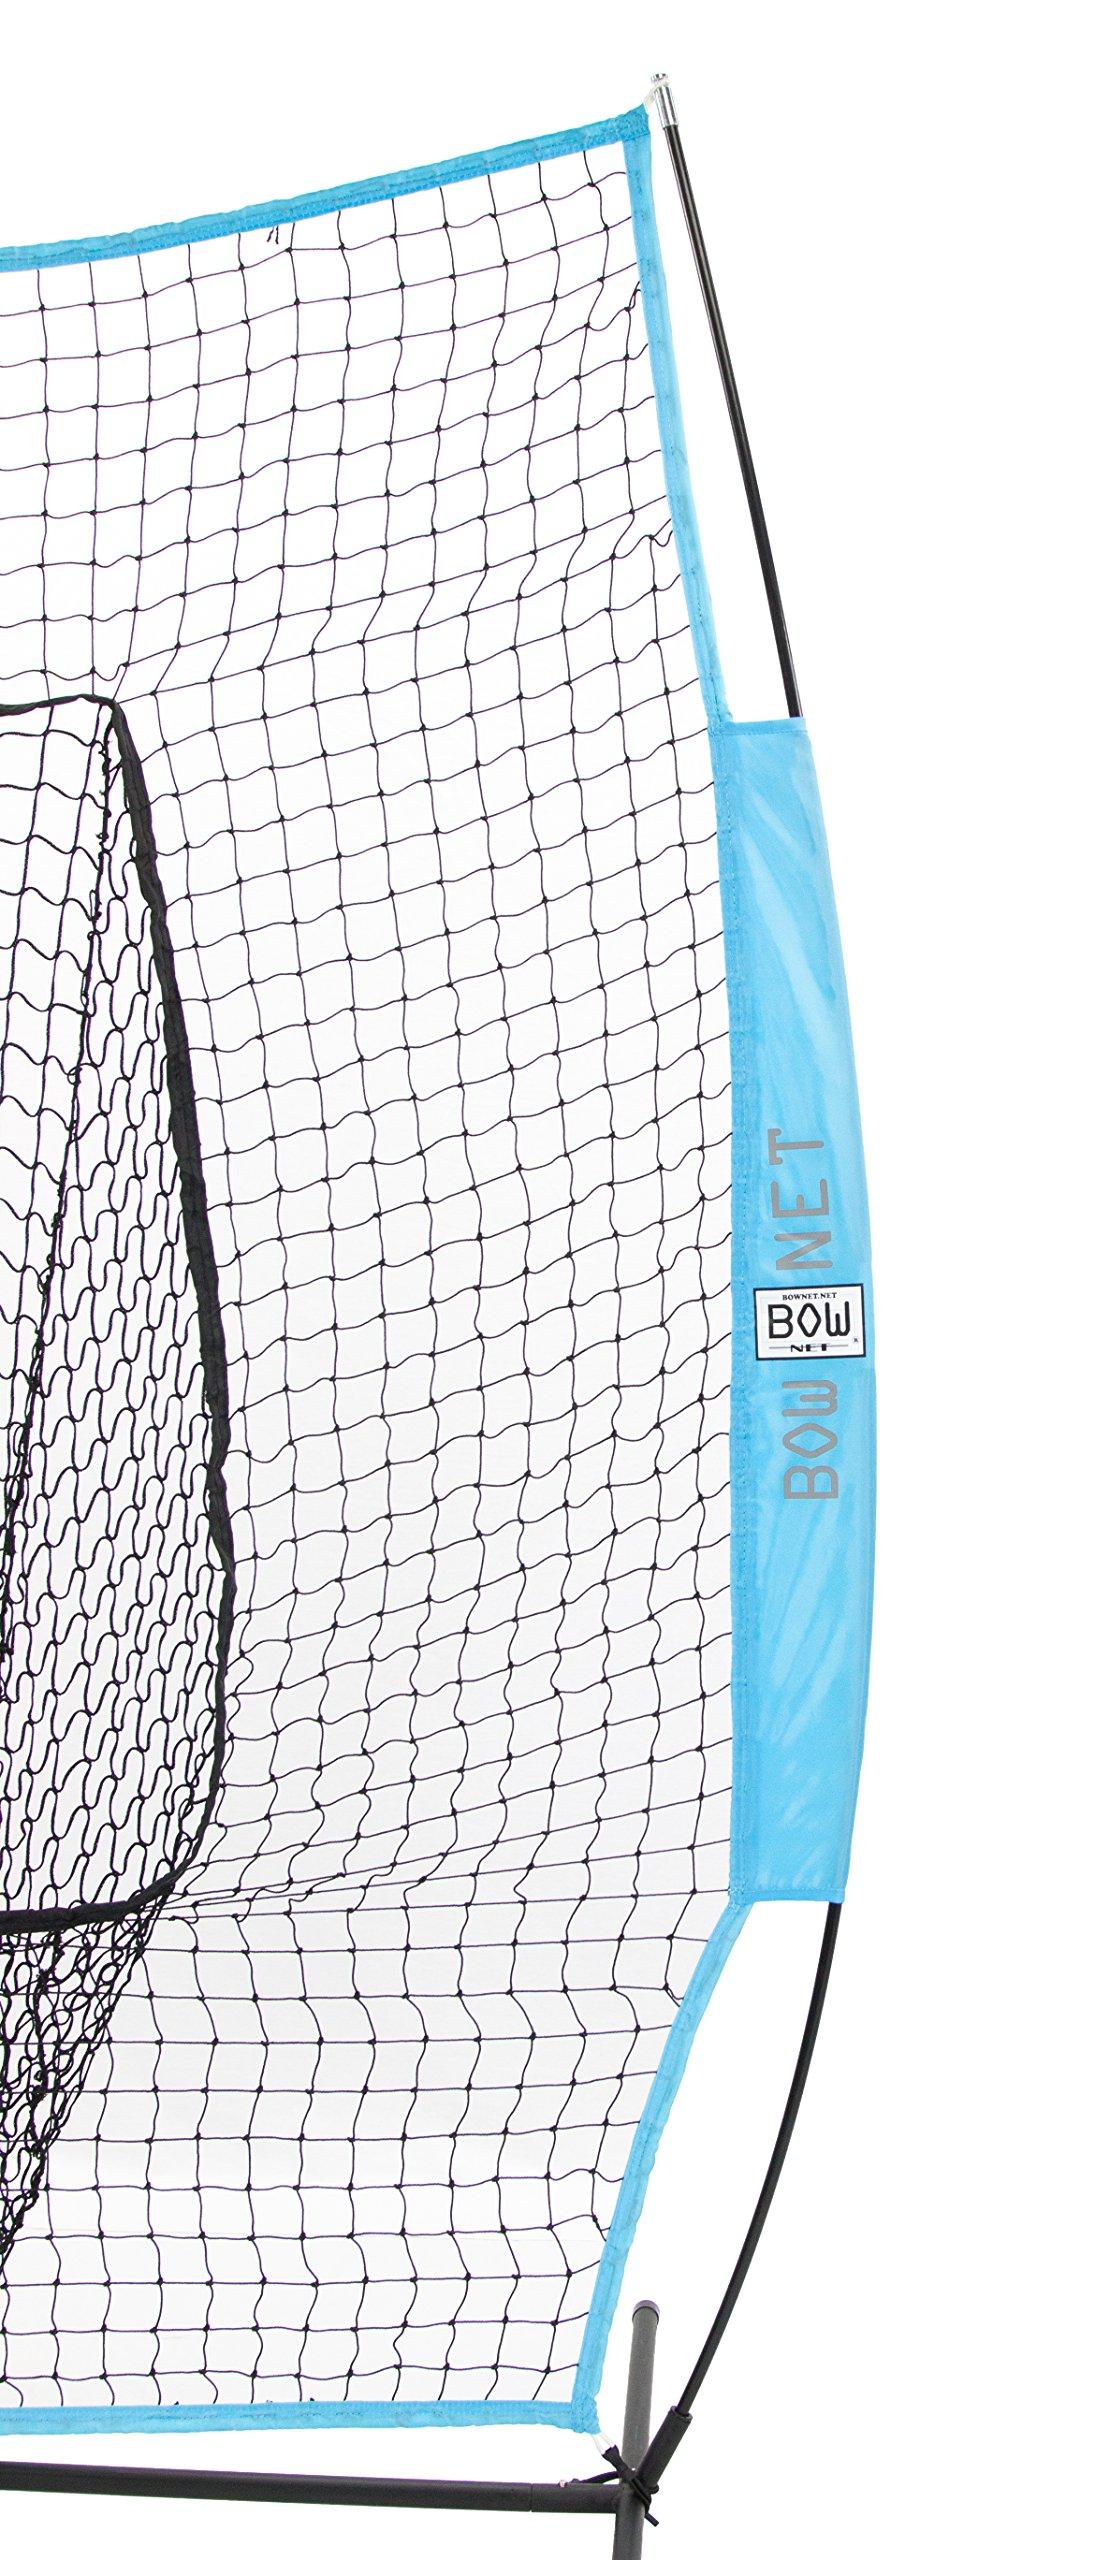 Bownet Big Mouth Portable Baseball/ Softball frame w/ Columbia Blue Net by USABatting (Image #2)